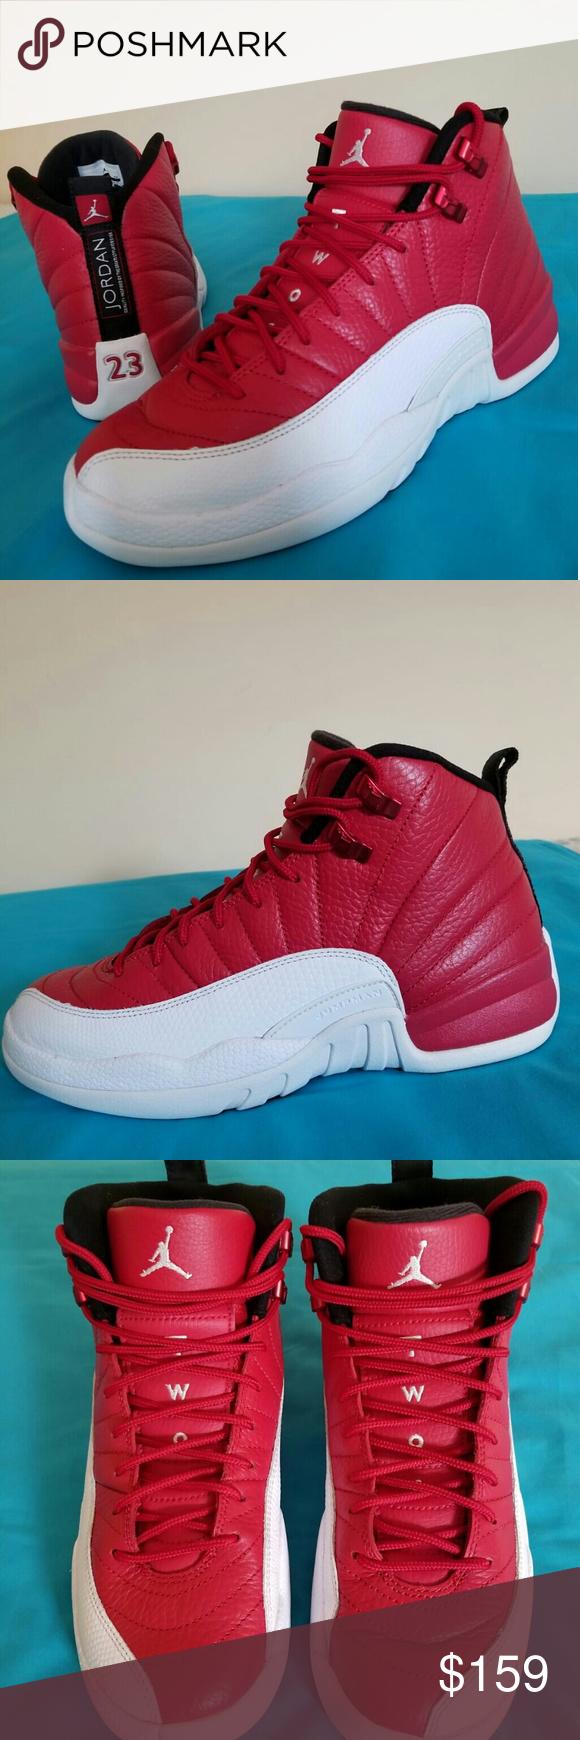 detailed look 20915 30a34 Nike Air Jordan 12 Retro Gym Red Alt Size 7 MEN For MEN SIZE ...